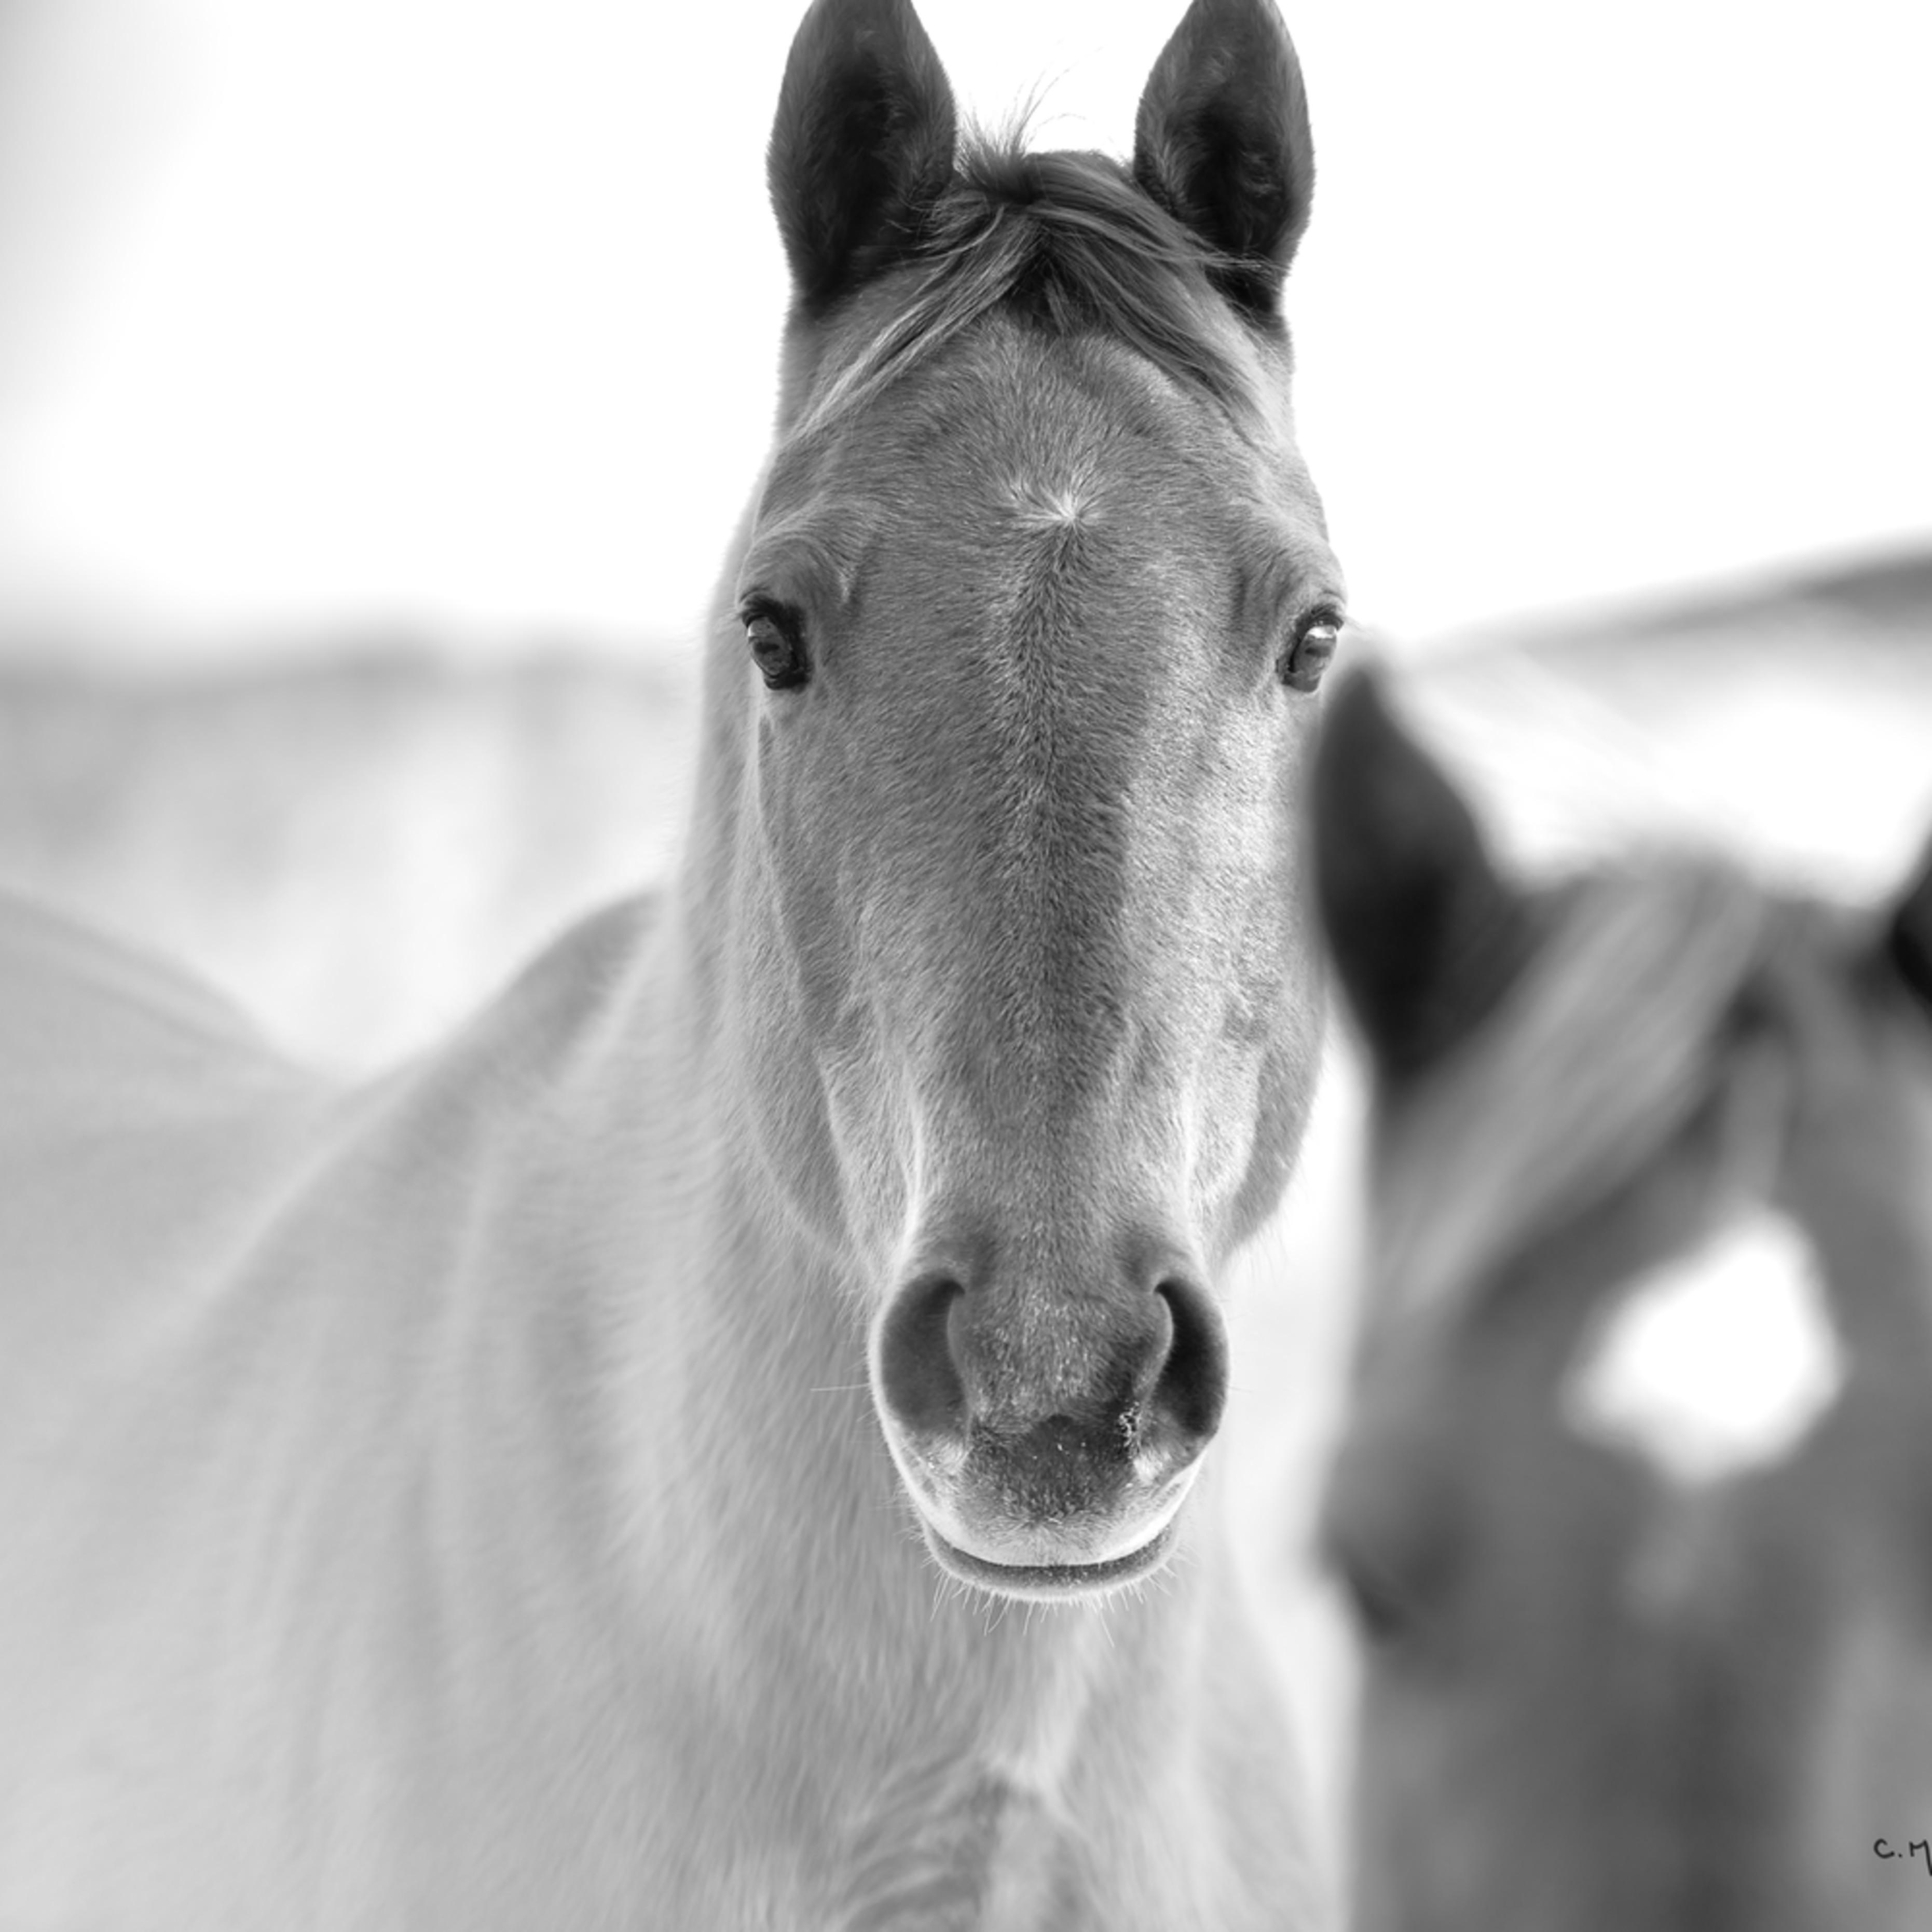 1245 faded horse 1.25 4654 x 3723 j100argb s2blko80p4h4v3rt 20190213 1602 gujqjk